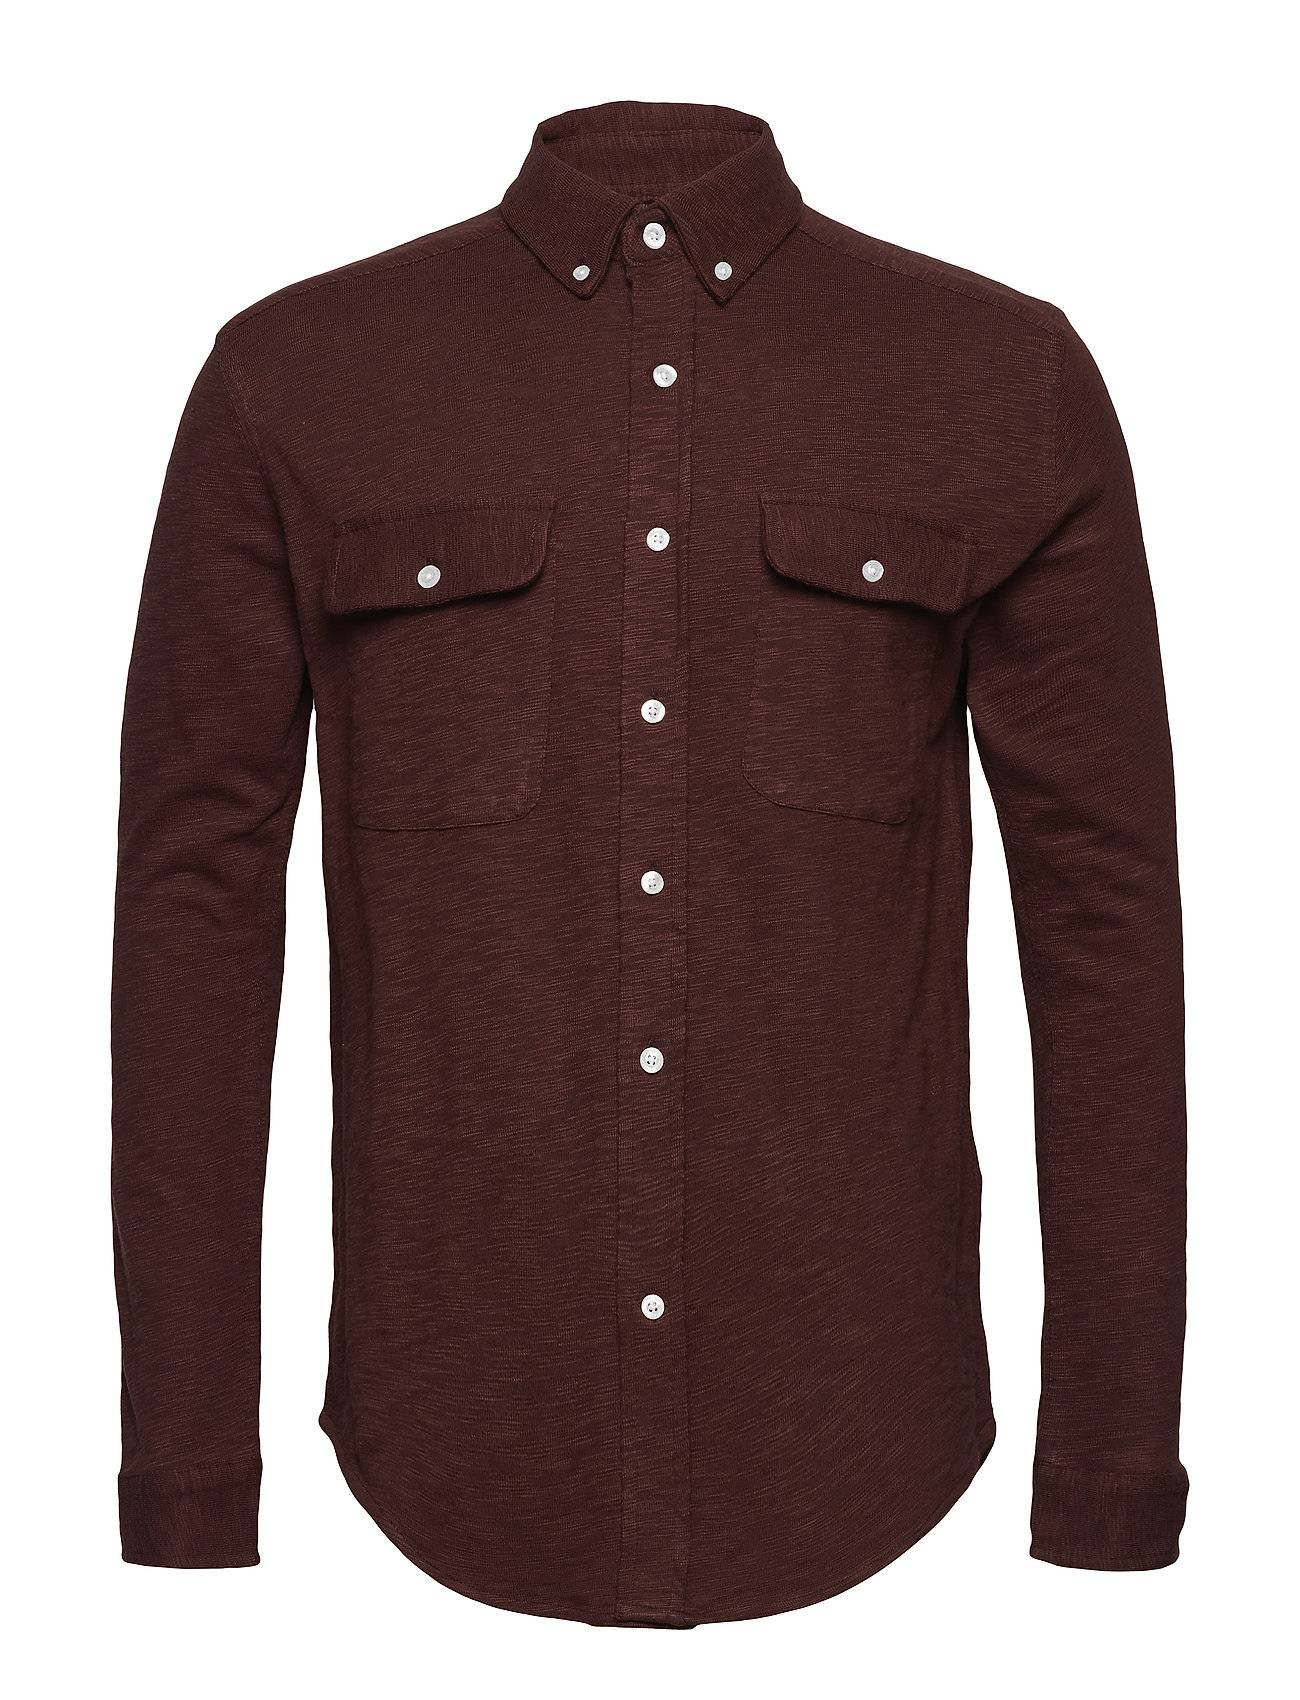 Knowledge Cotton Apparel Slope Jersey Shirt - Gots